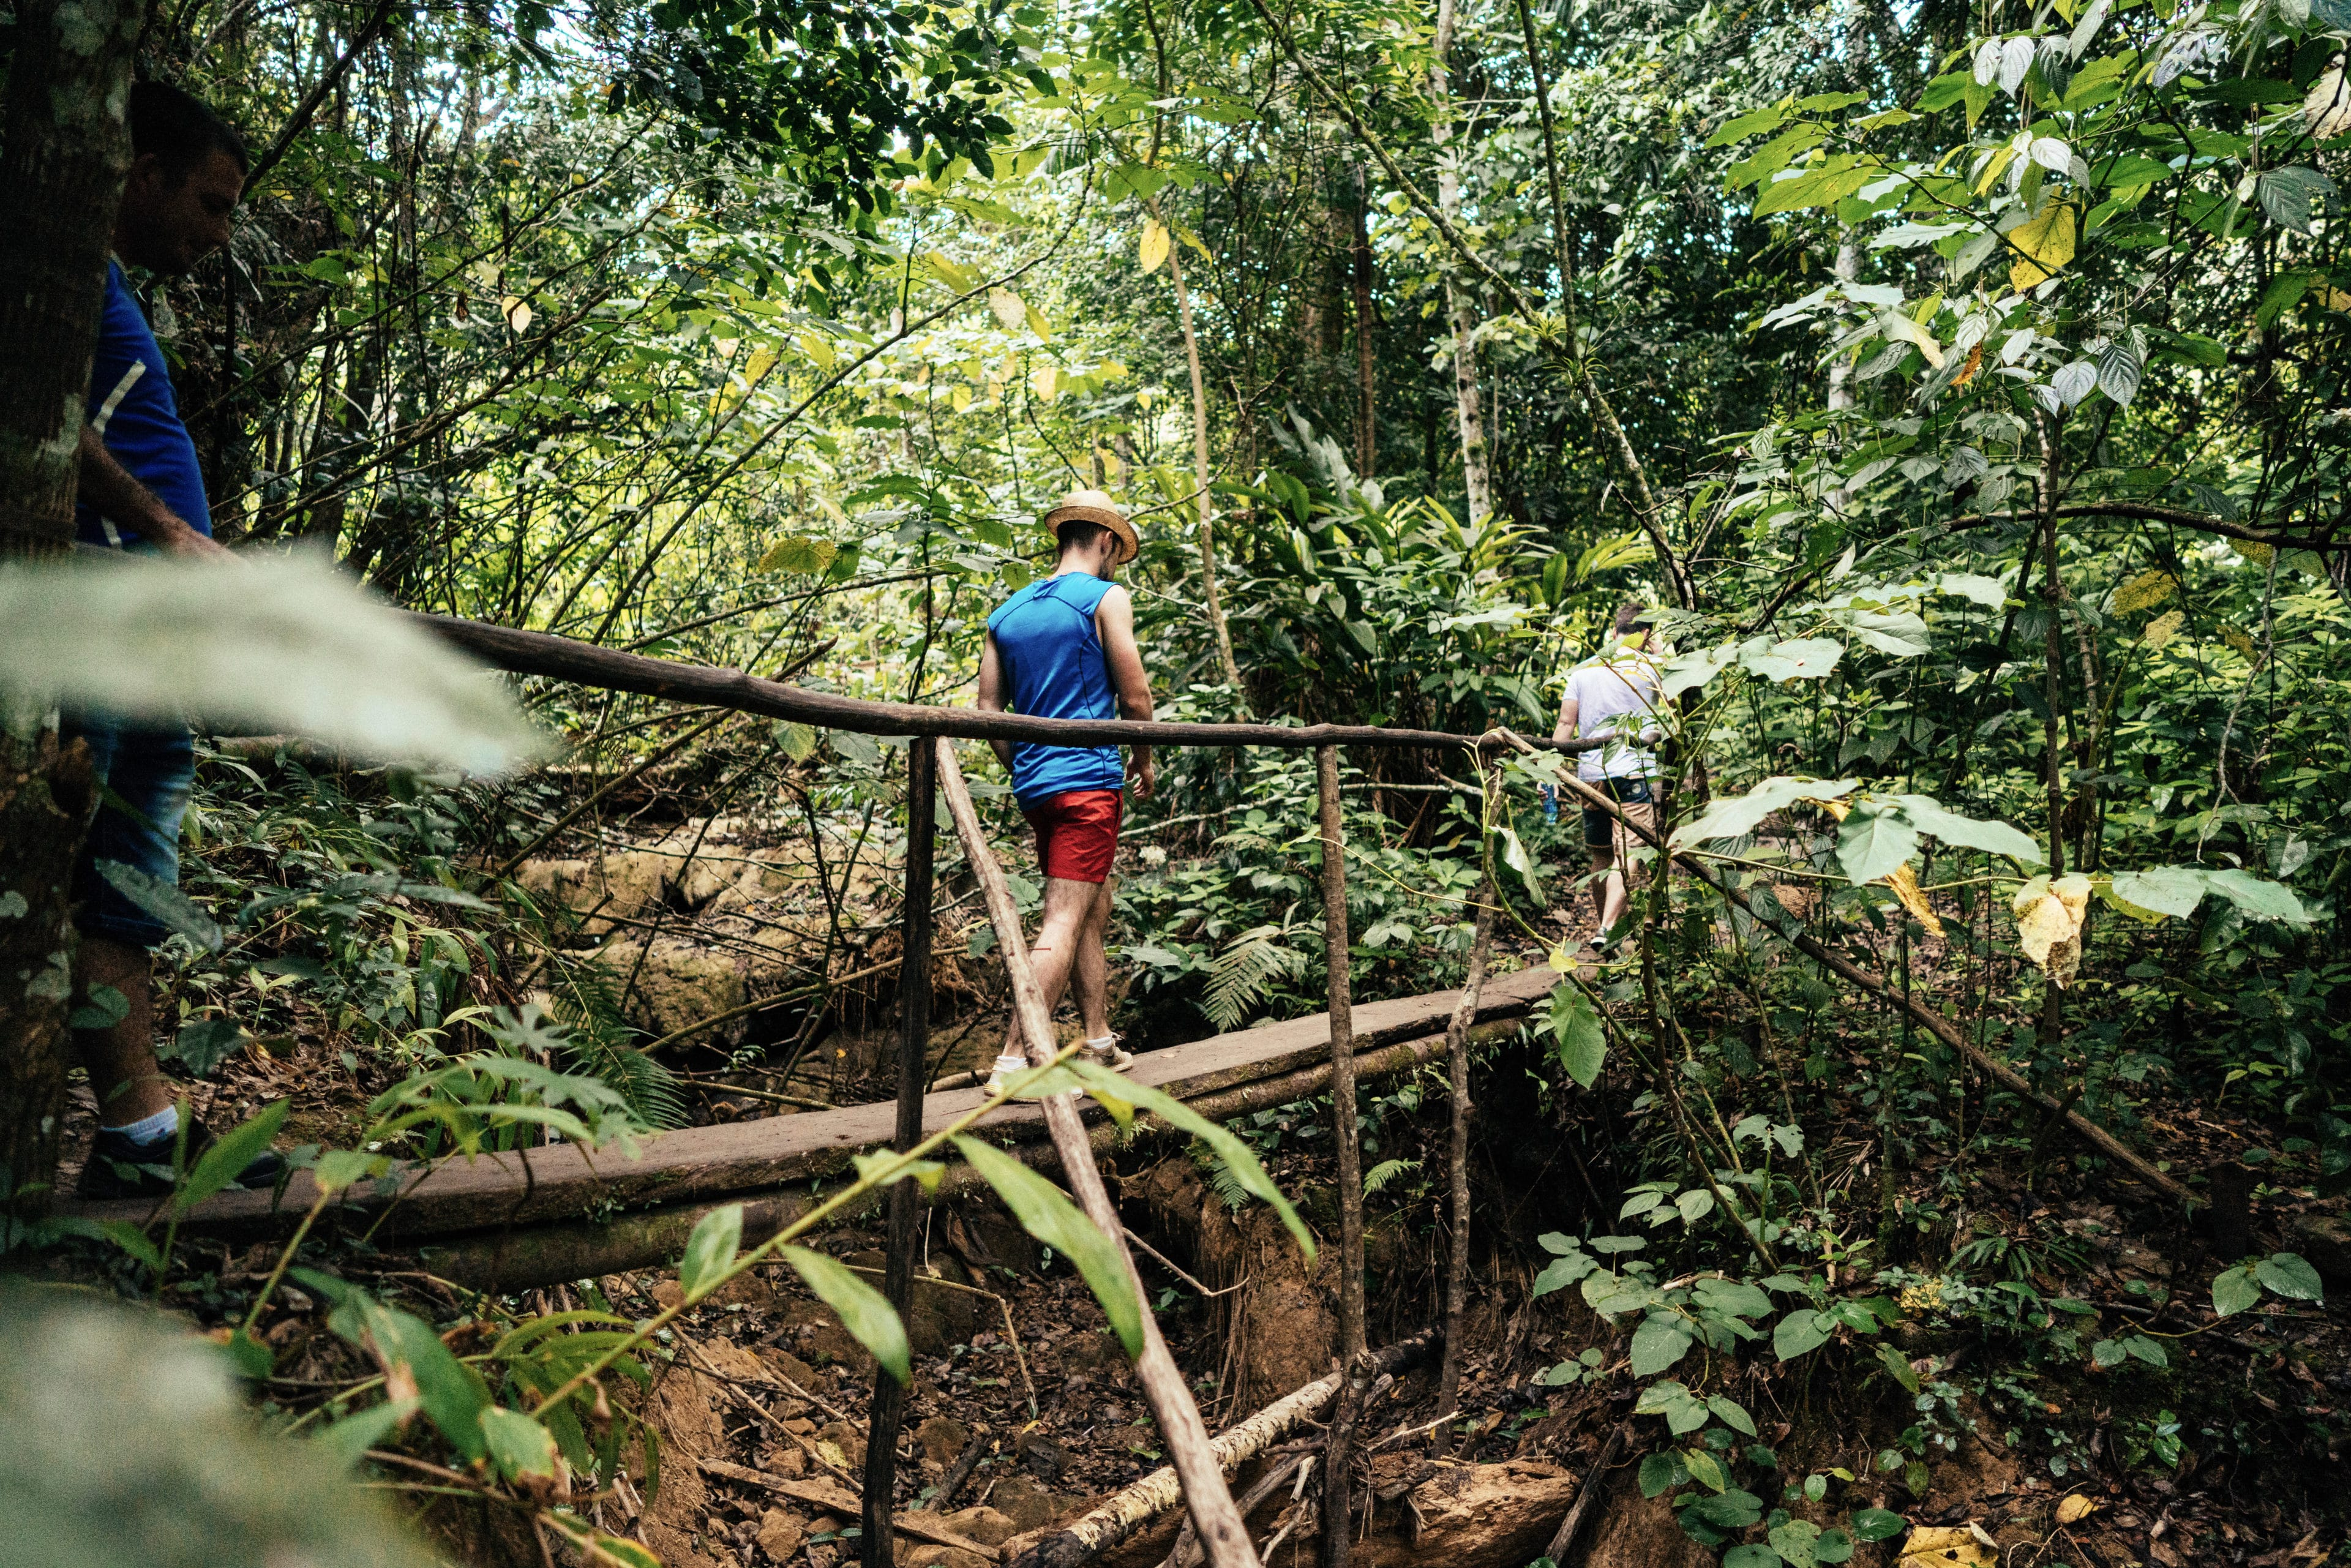 Cuba-Reisende wandern durch einen Nationalpark in Kuba